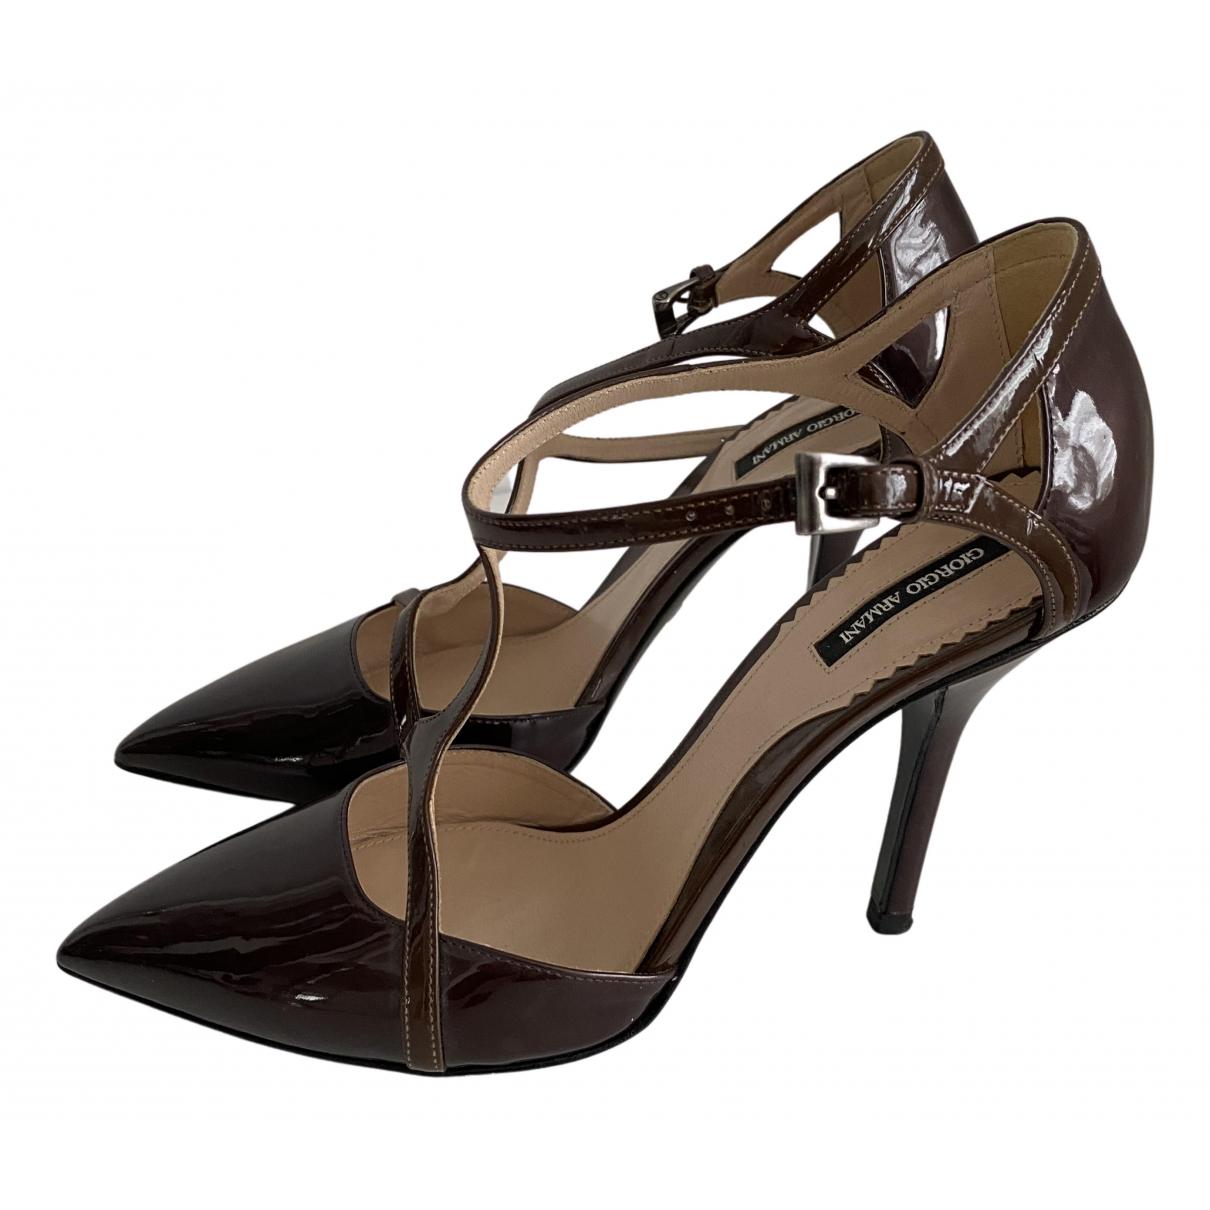 Giorgio Armani N Brown Patent leather Heels for Women 36 EU